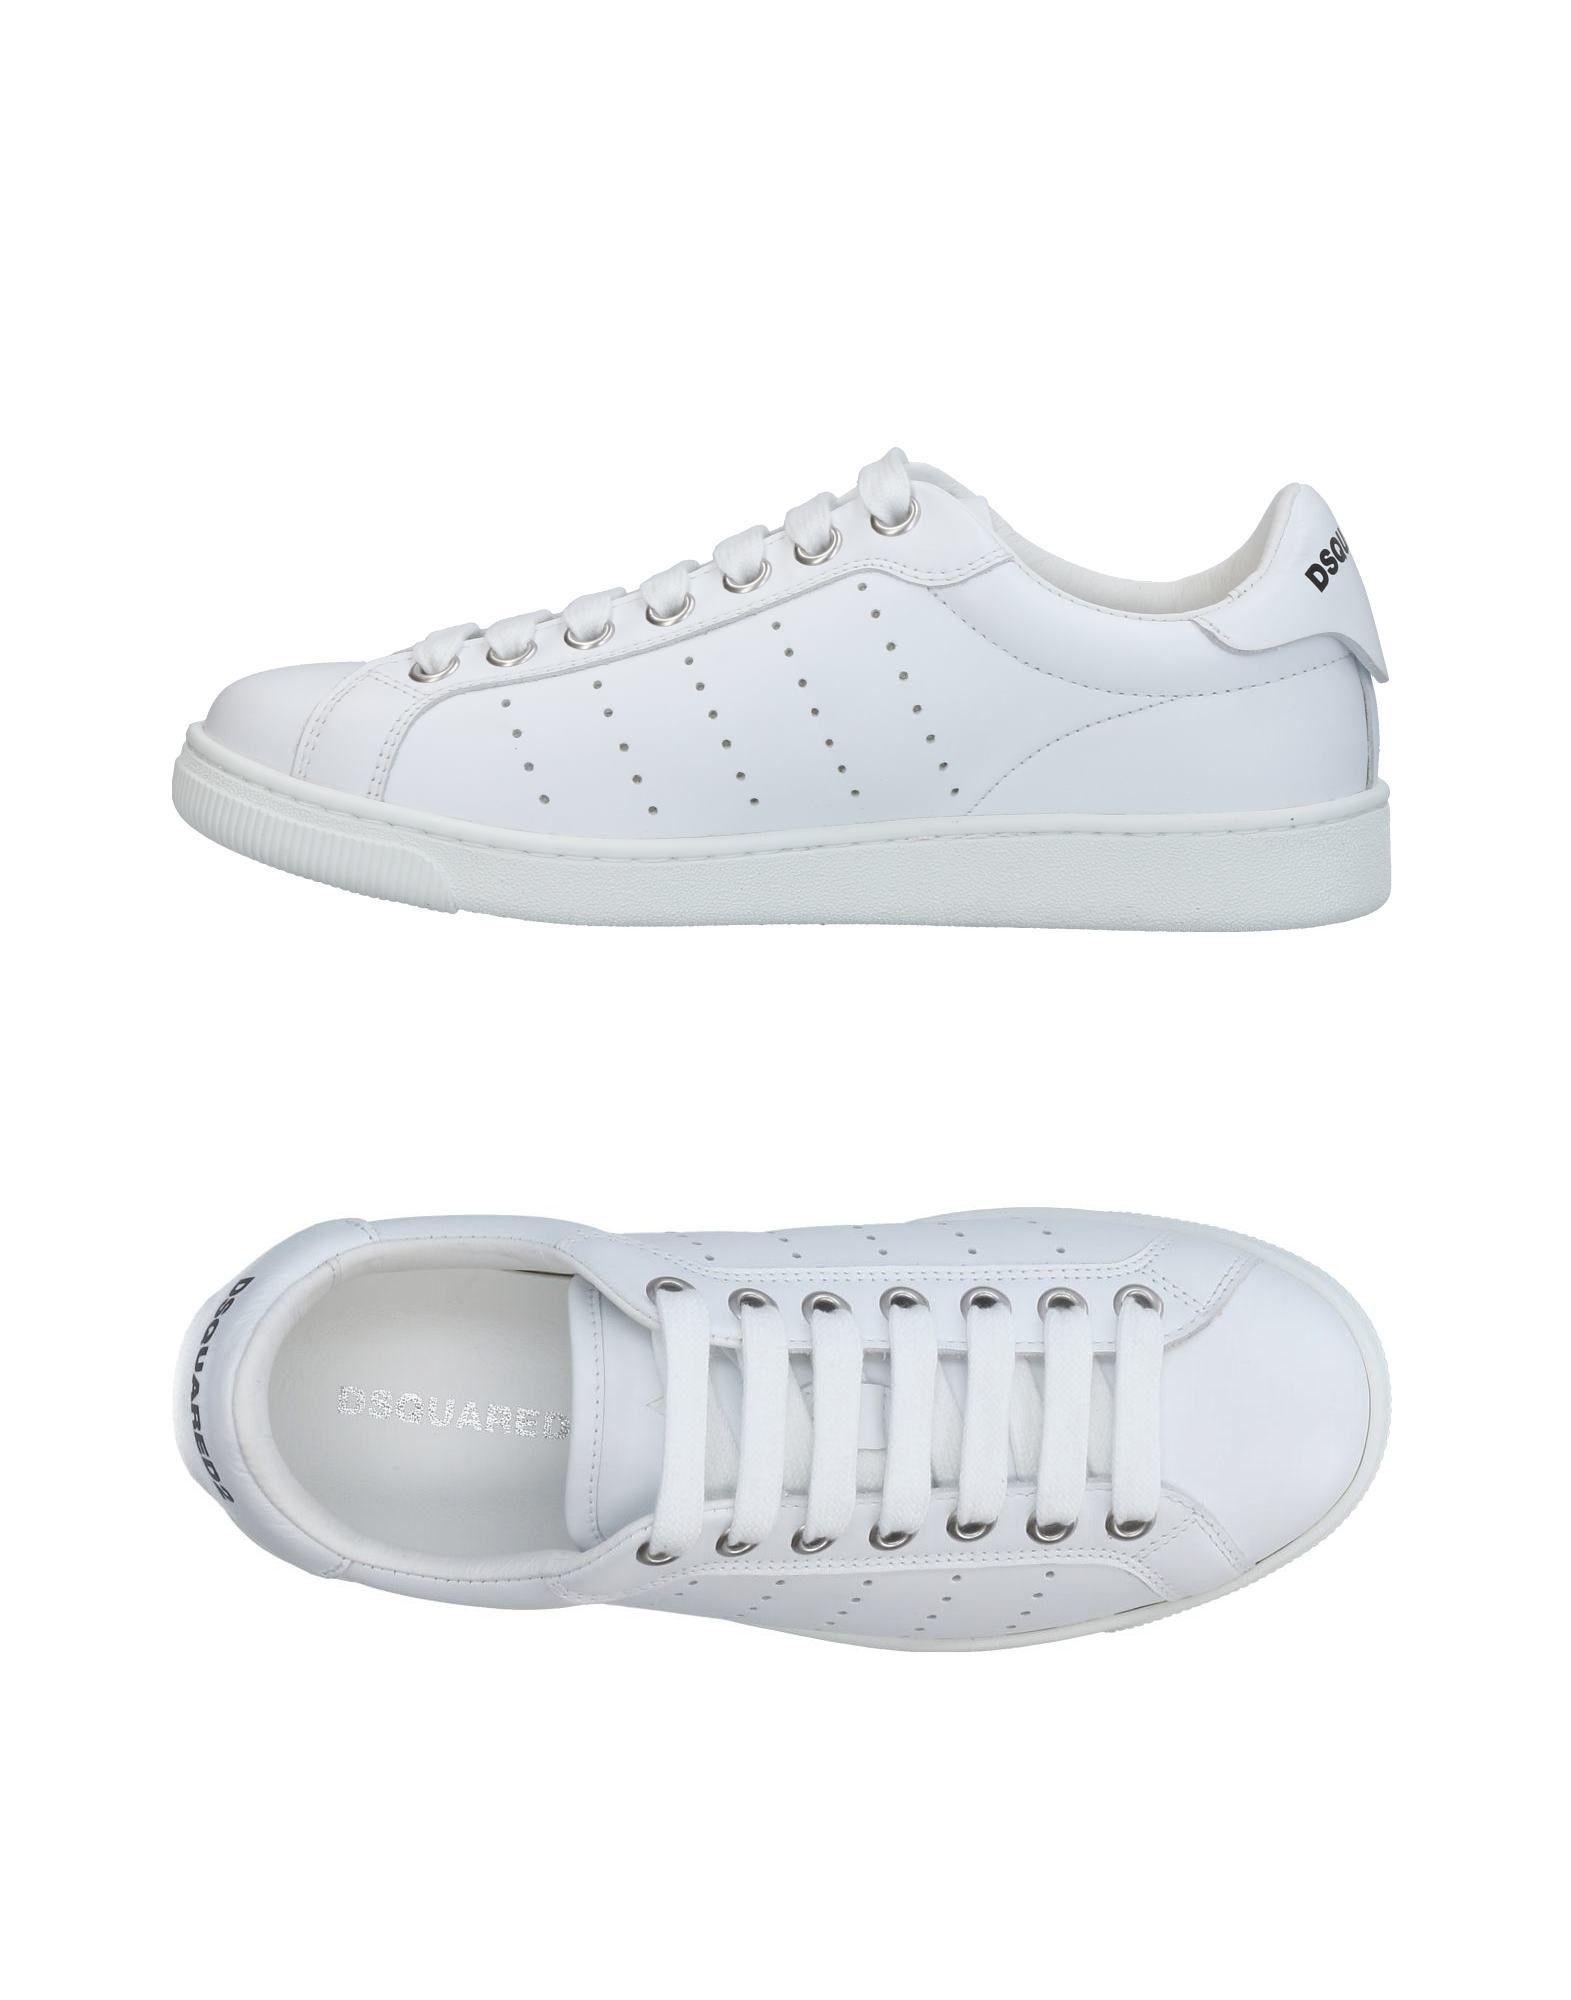 Dsquared2 Sneakers Herren Herren Sneakers  11462185GR a08e1a